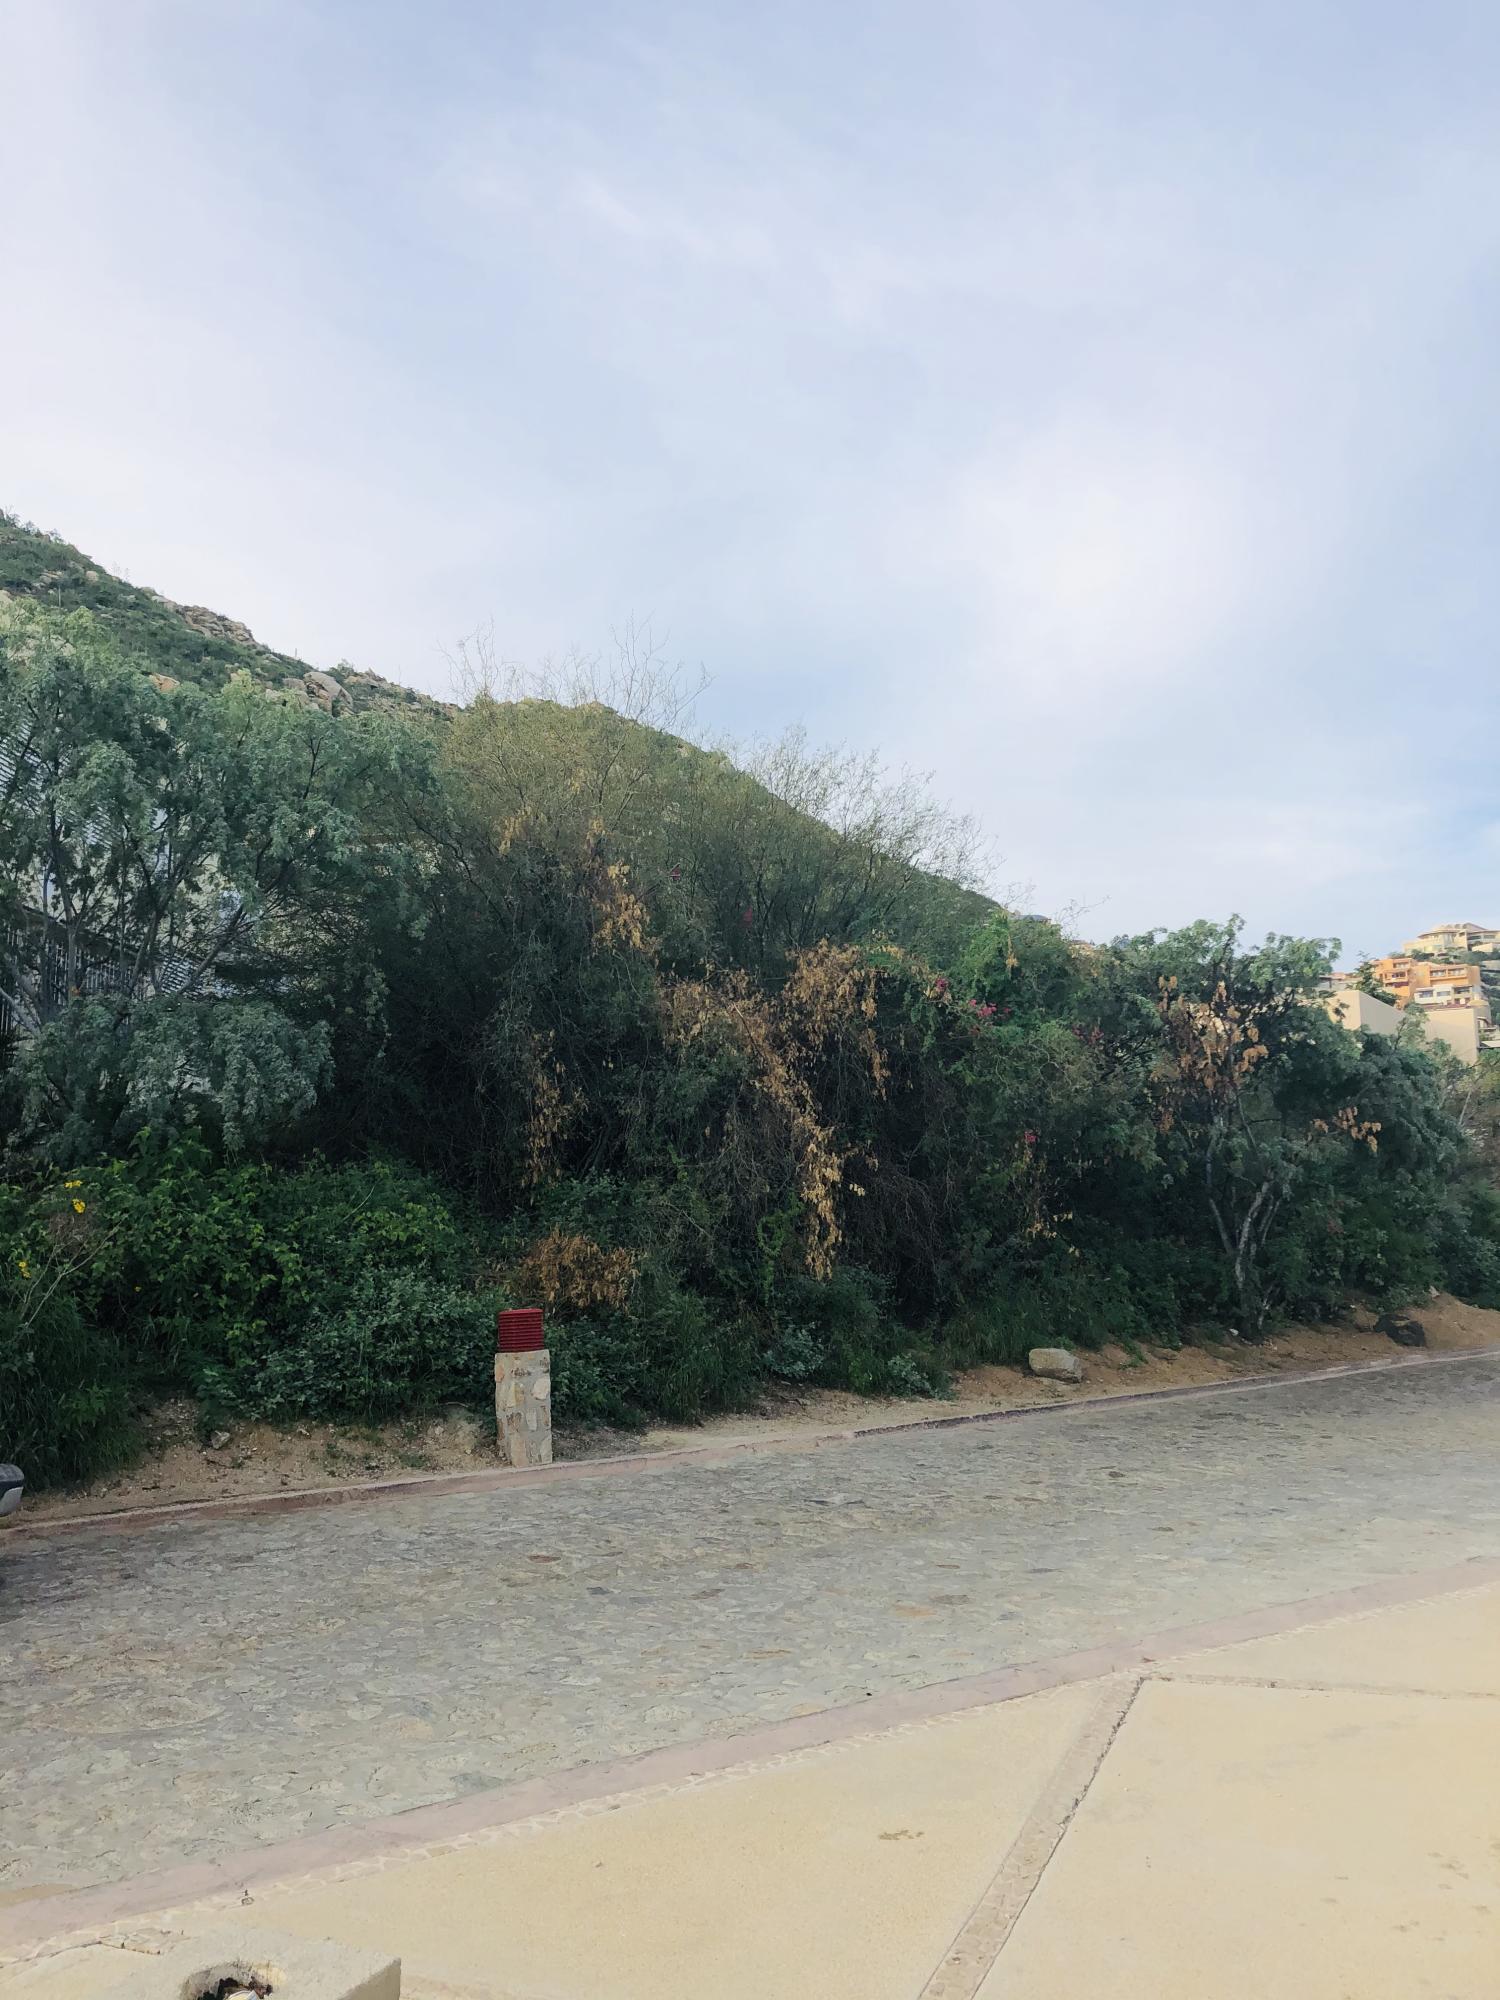 Lot 14 Fracc 12, Cabo San Lucas